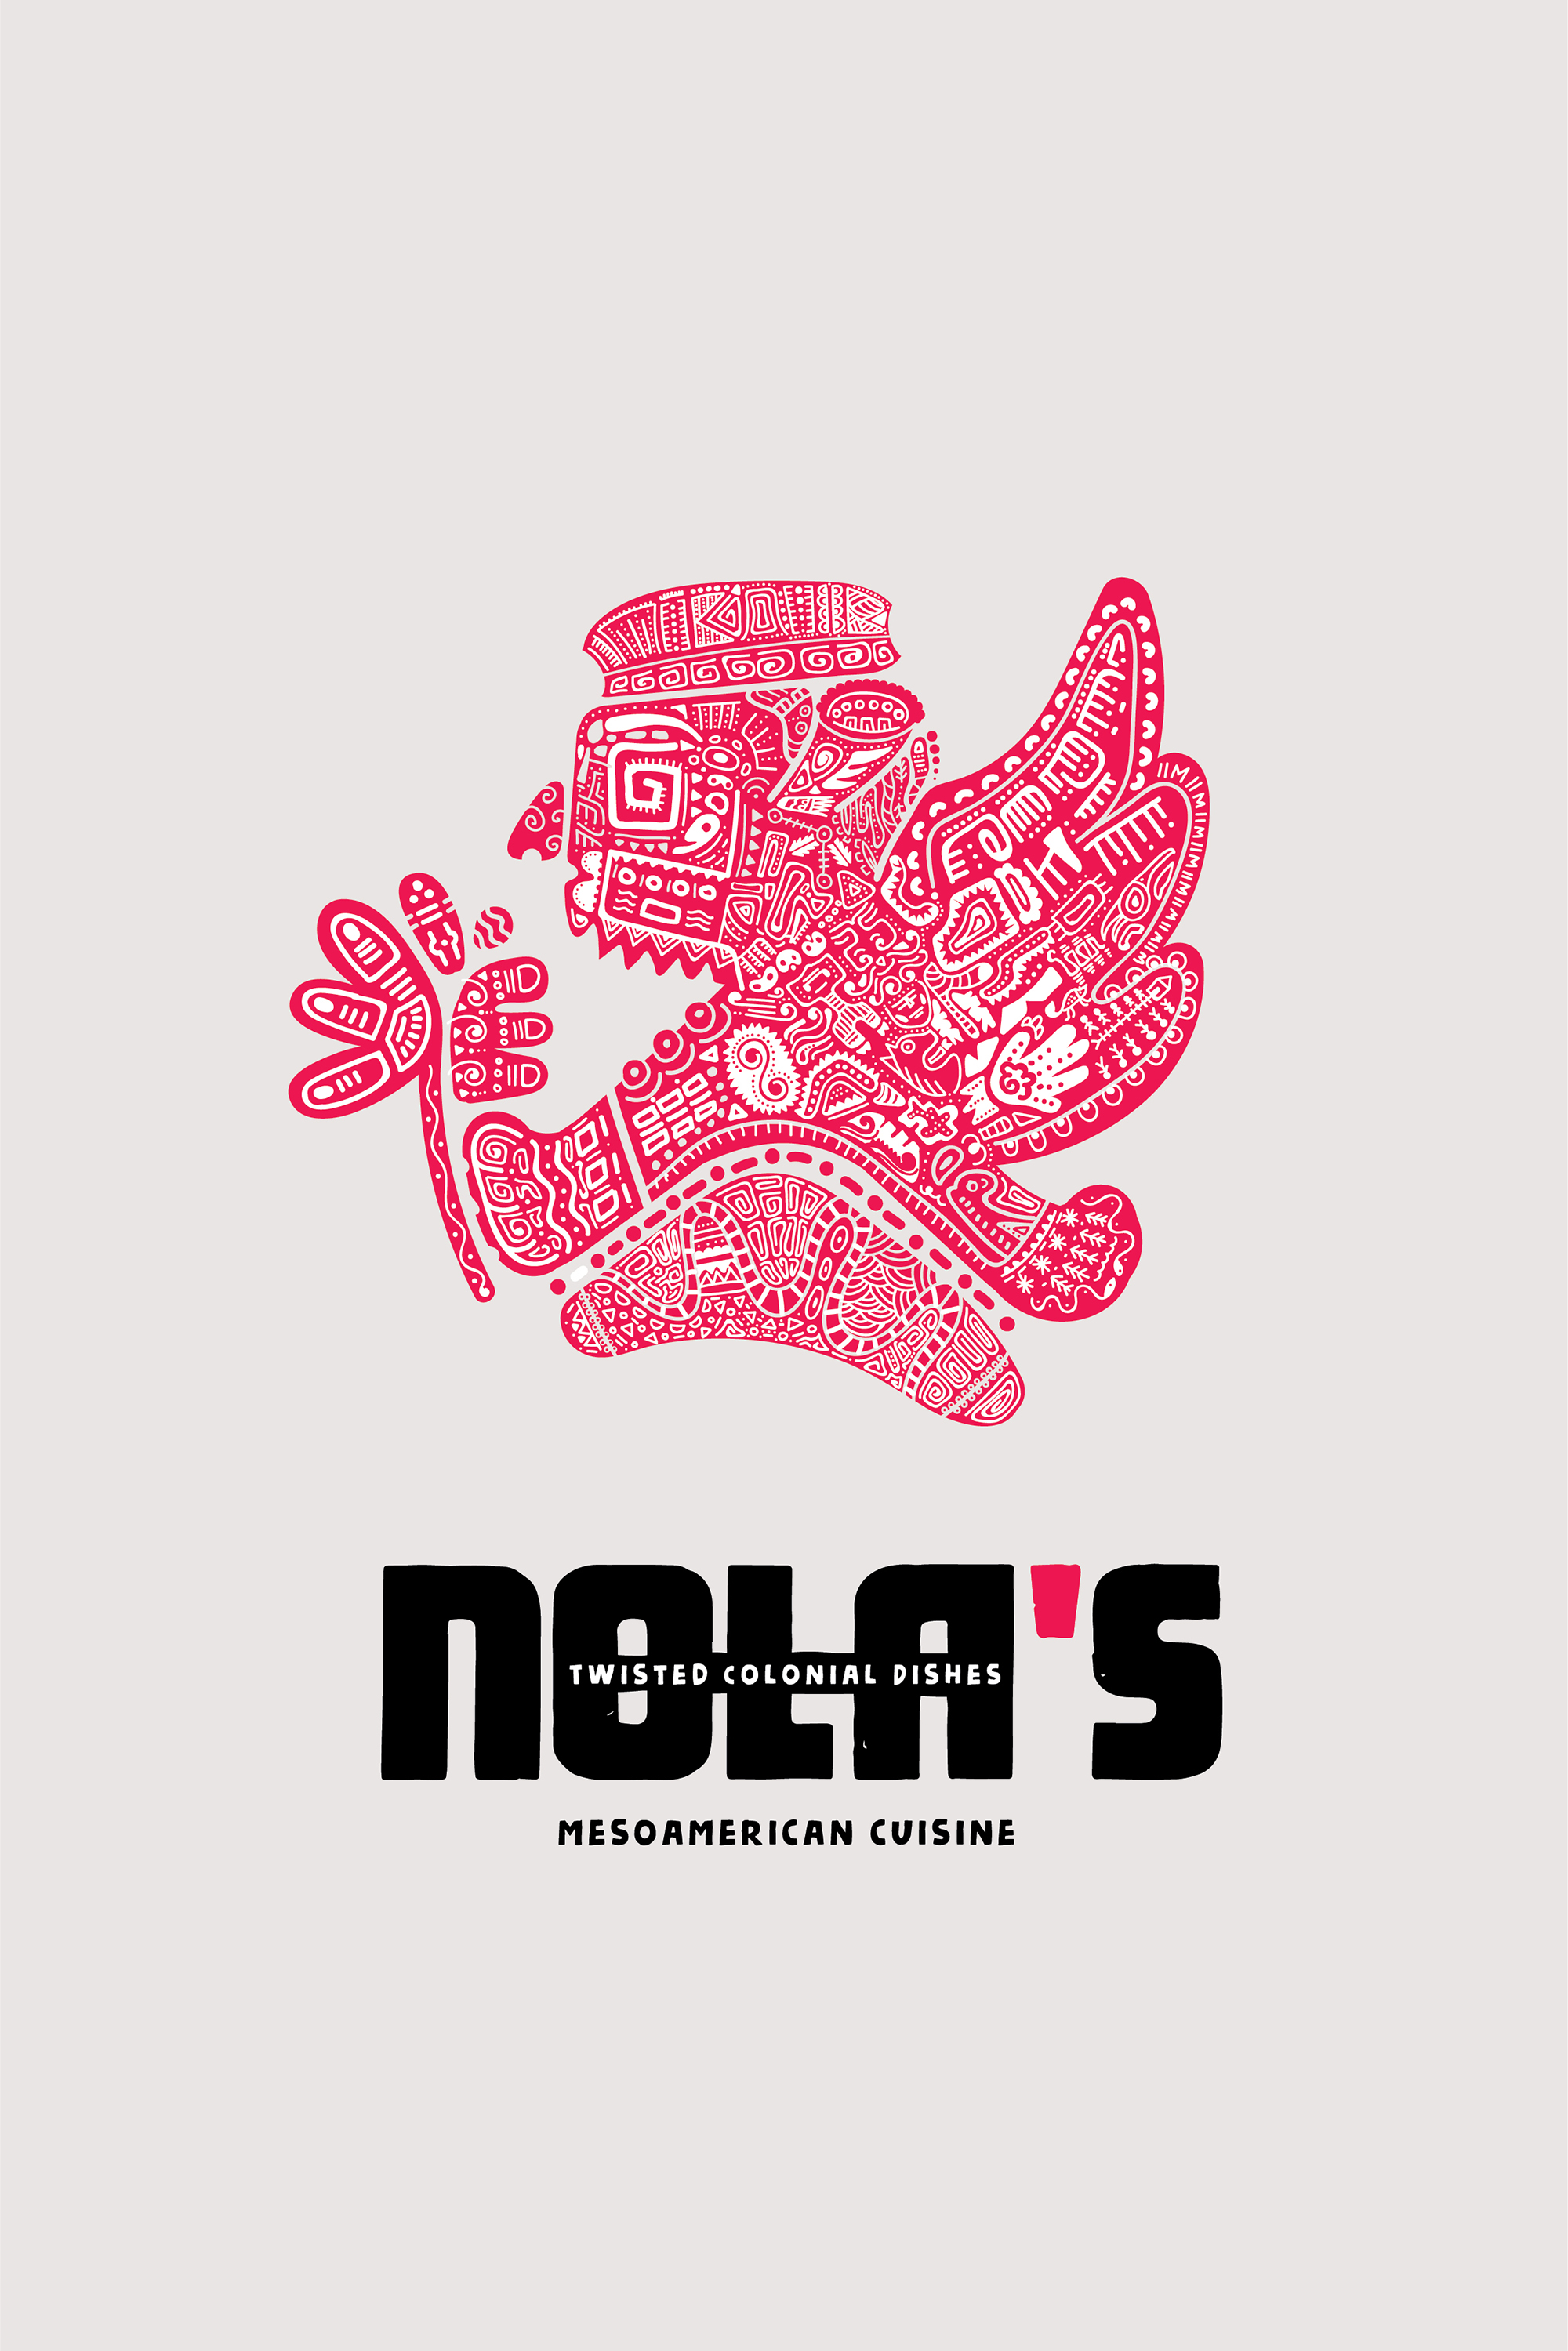 Nola's MisoAmerican Cuisine